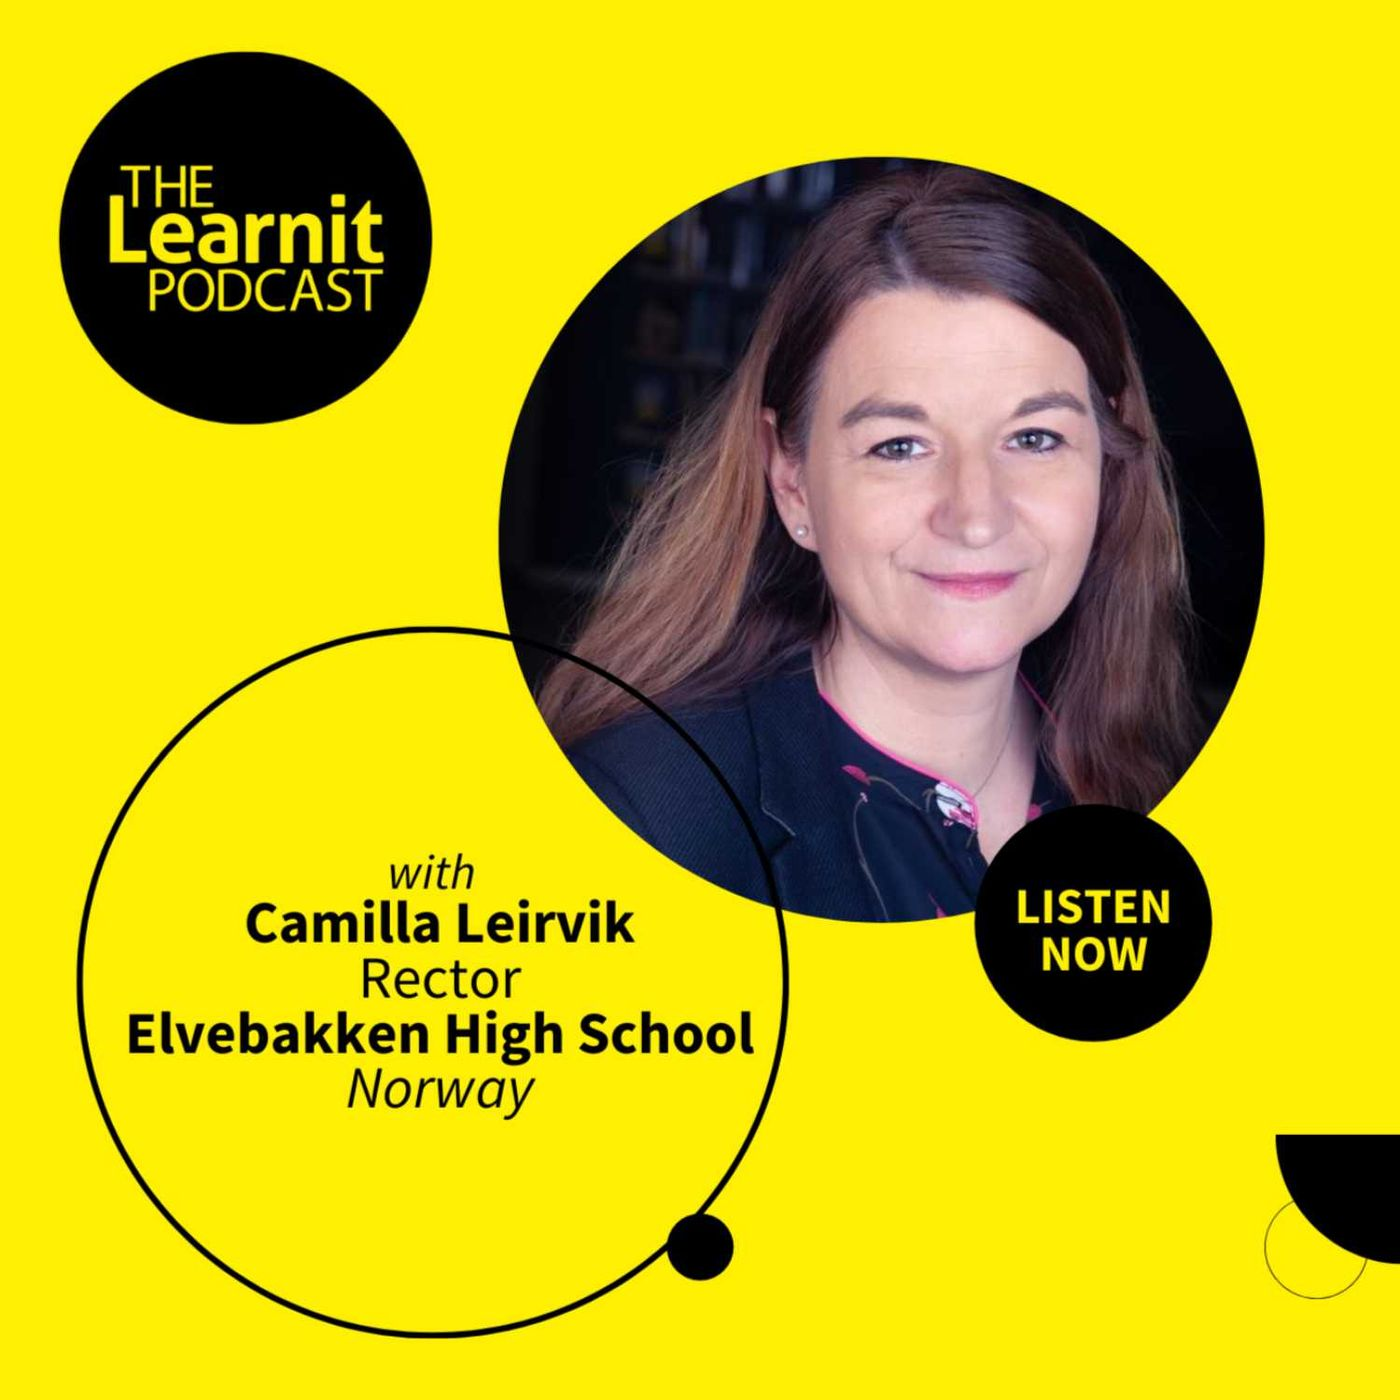 #26, Camilla Leirvik, Rector, Elvebakken High School: Open book tests + flexible schedules = success?